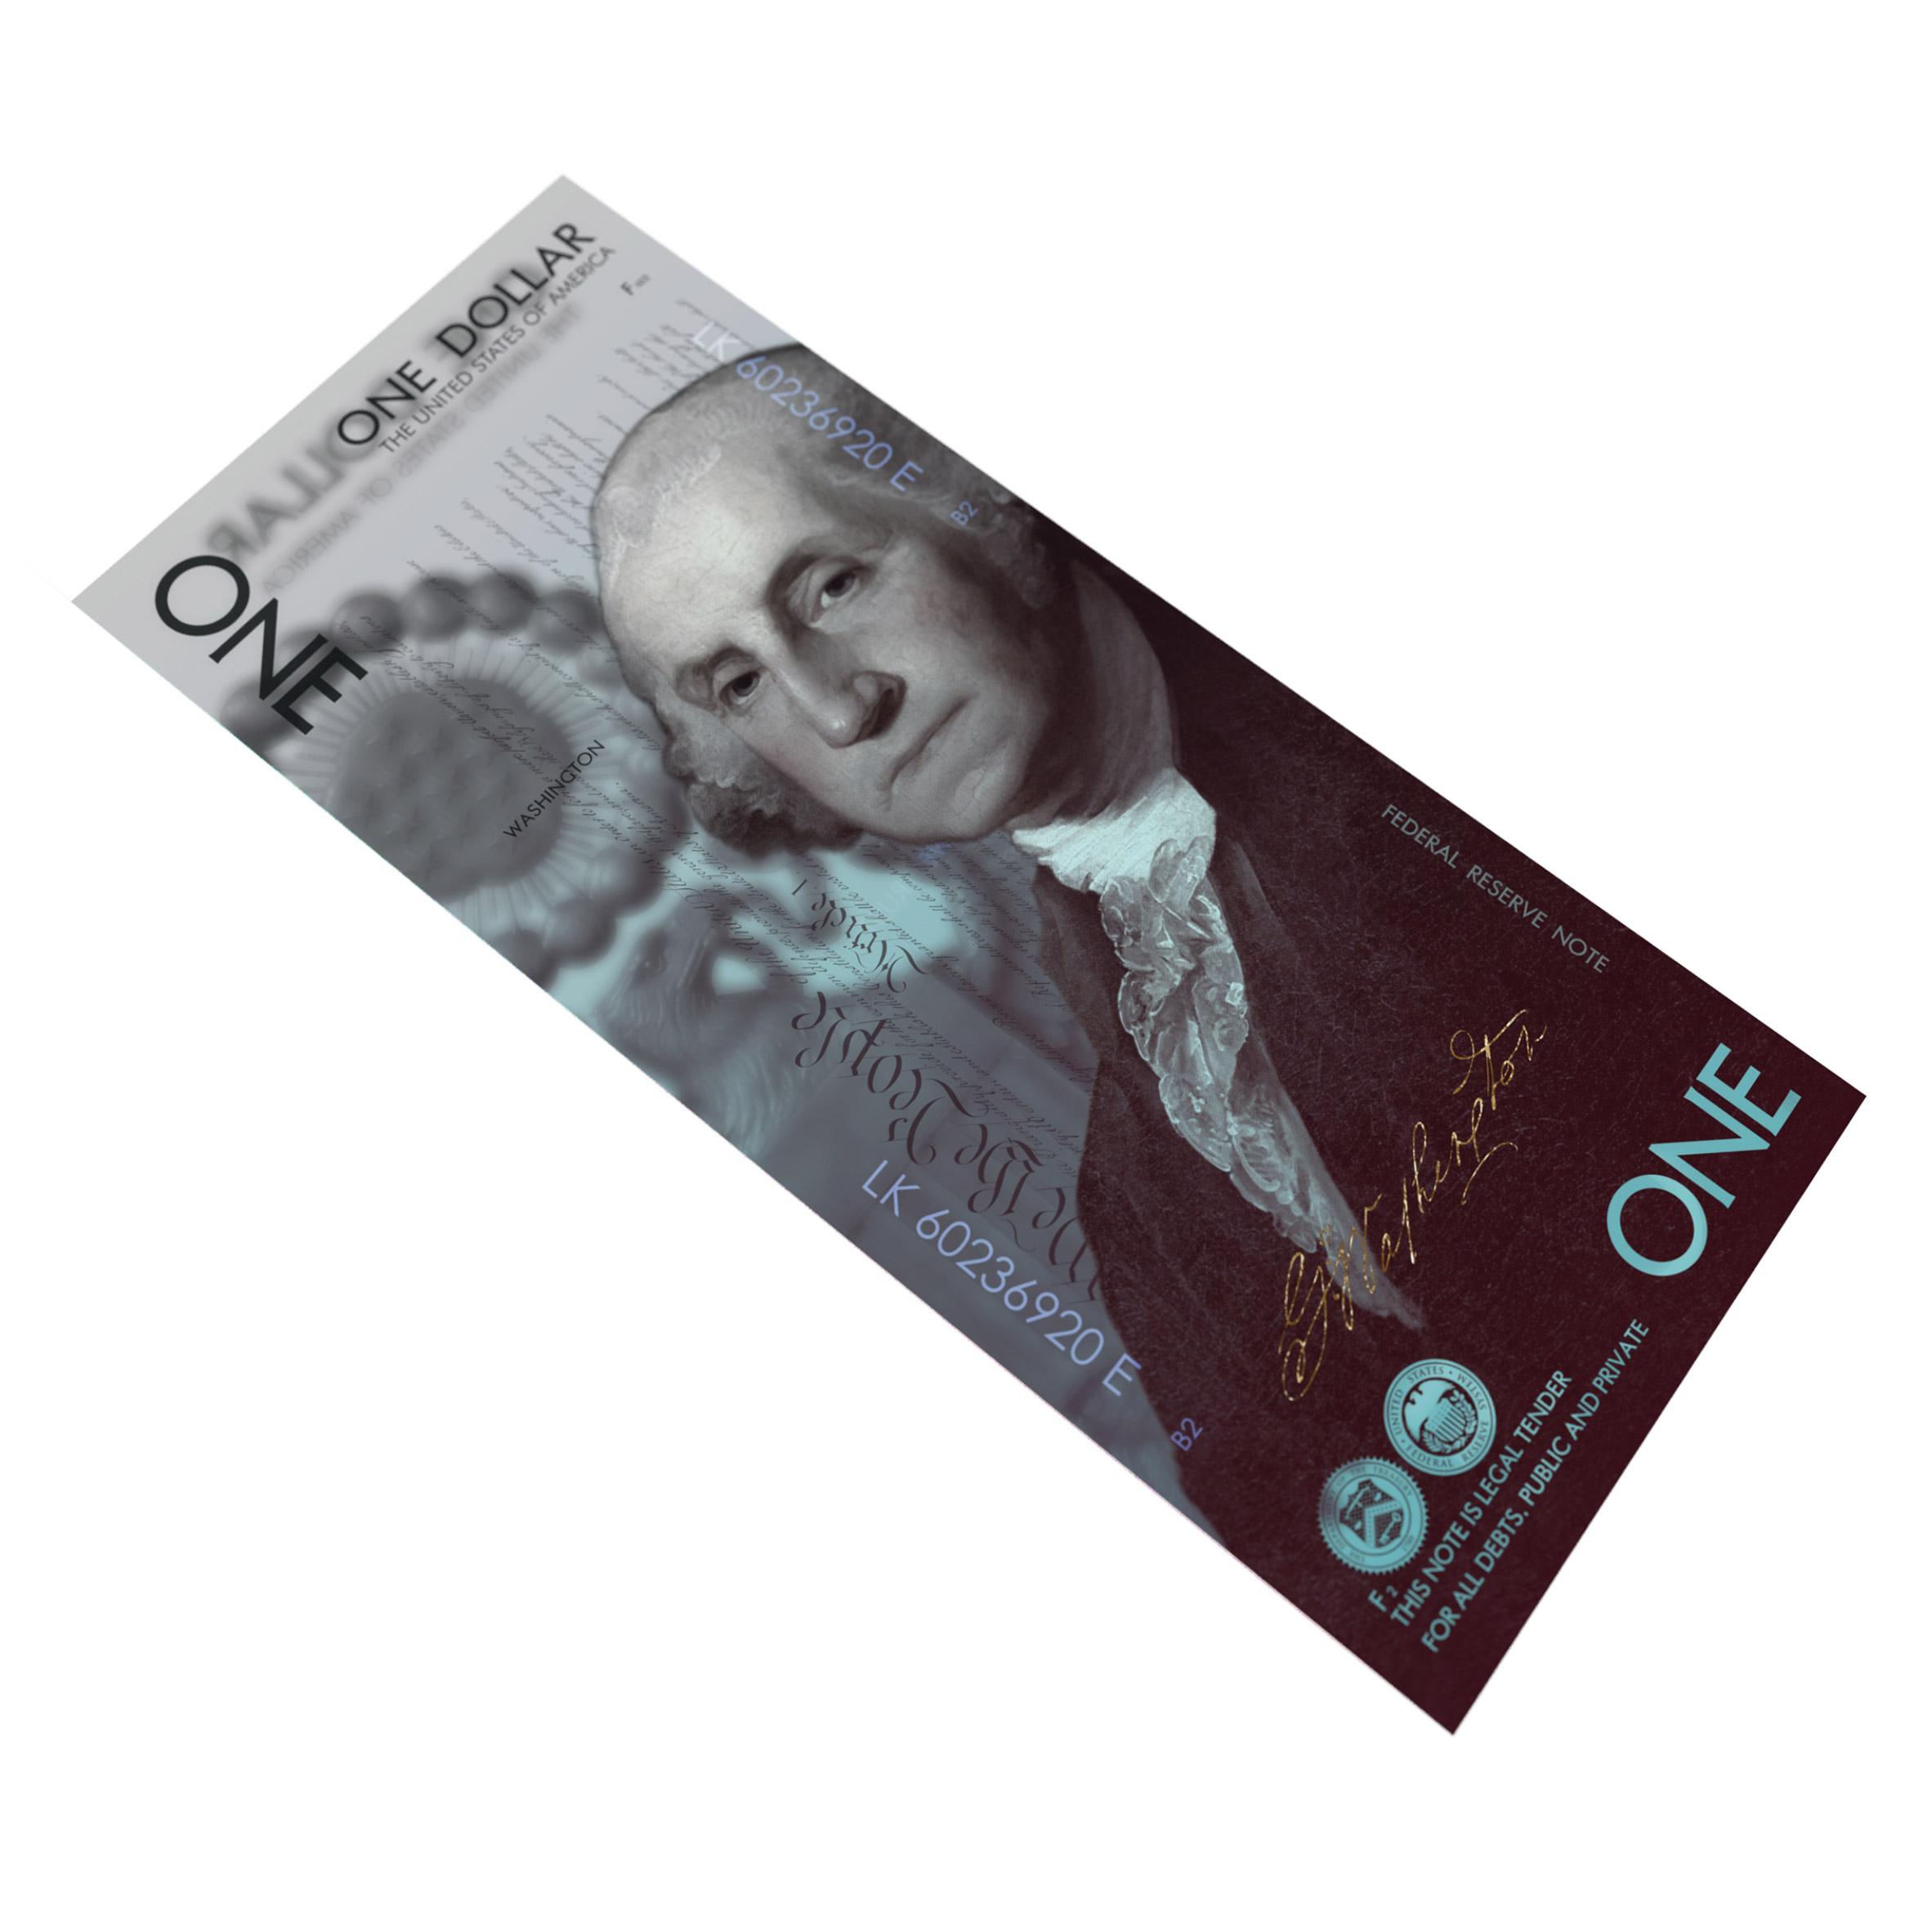 Andrey Avgust reimagines US dollar bills as vertical designs